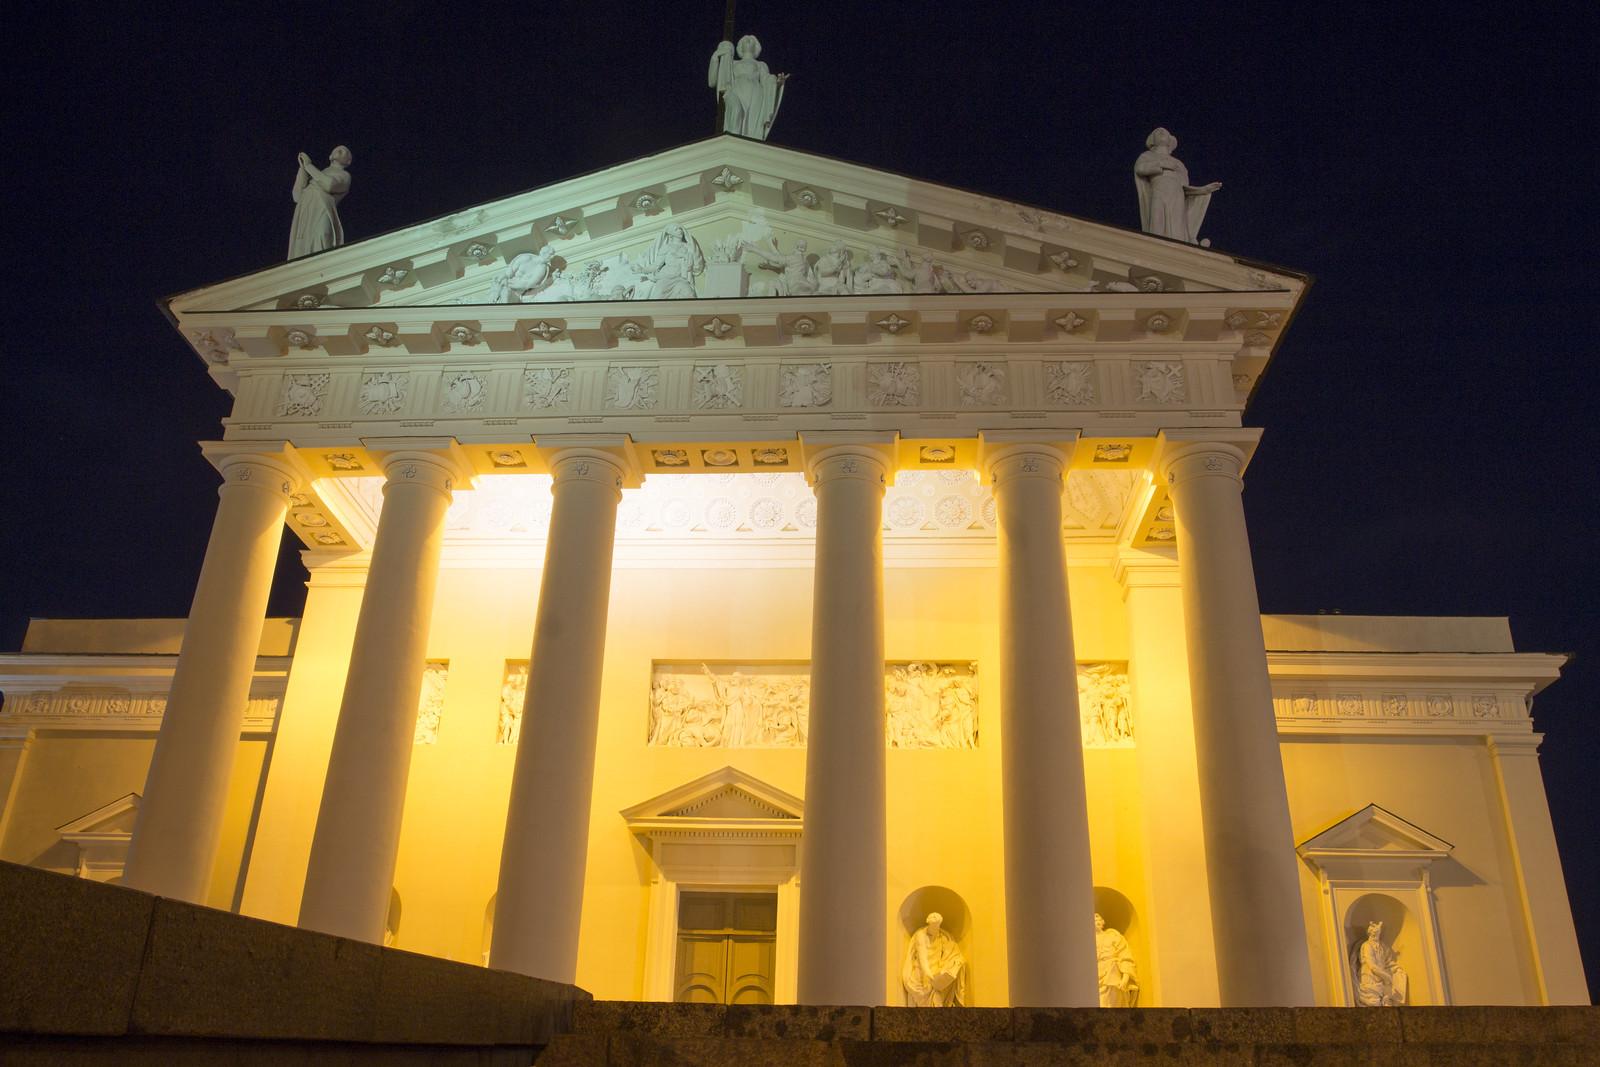 Katedra wileńska - Vilnius